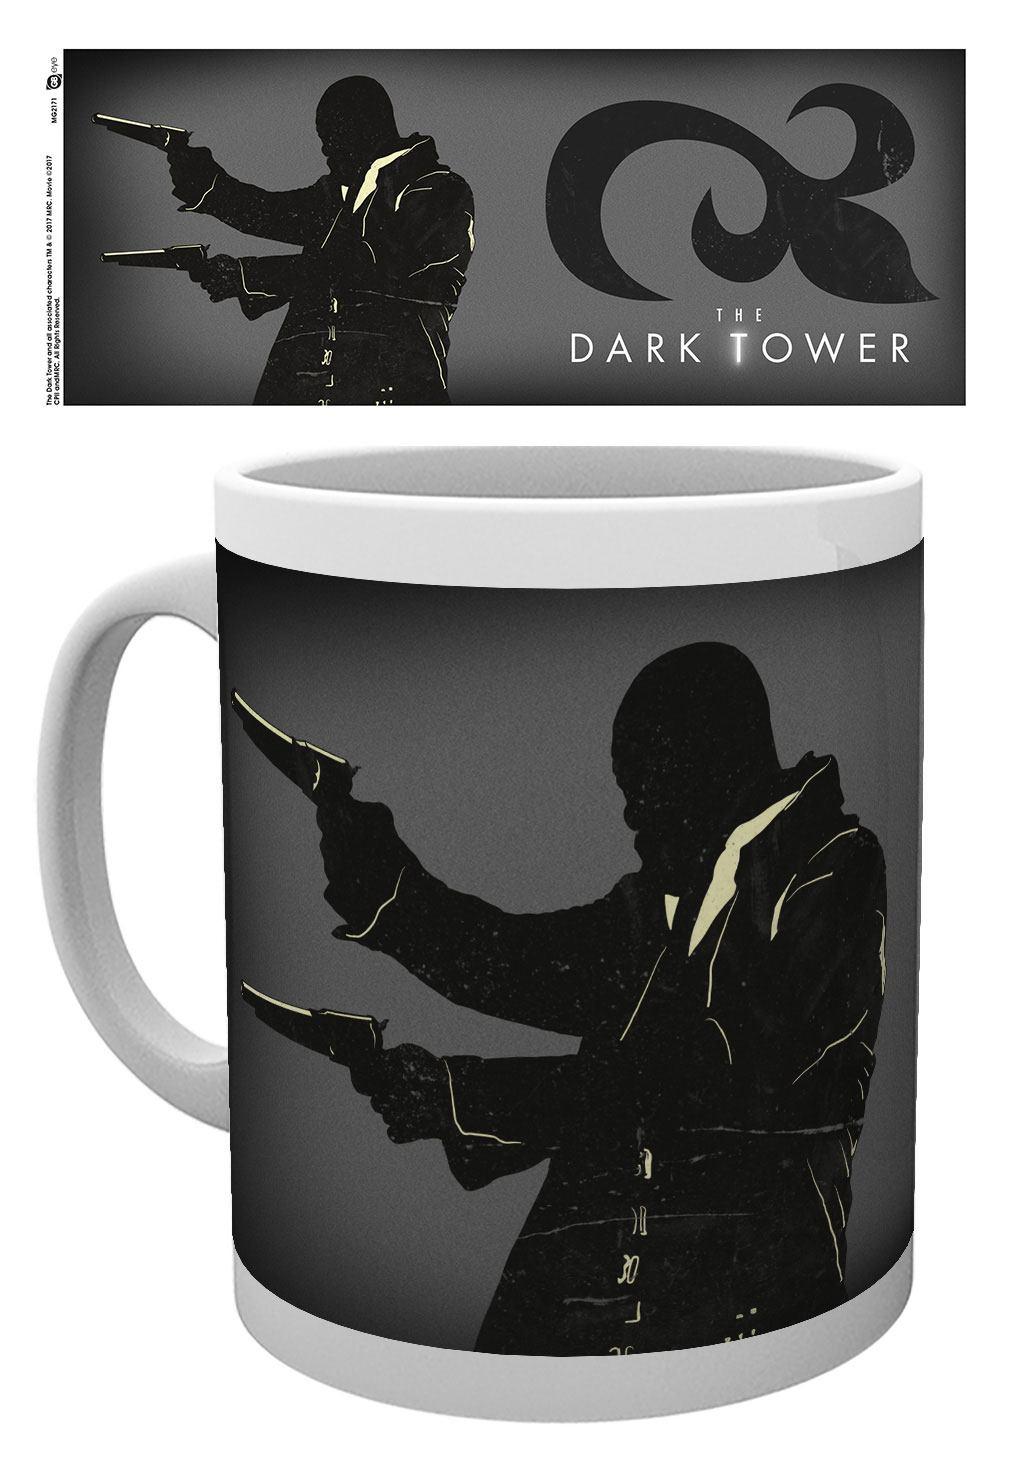 The Dark Tower Mug The Gunslinger